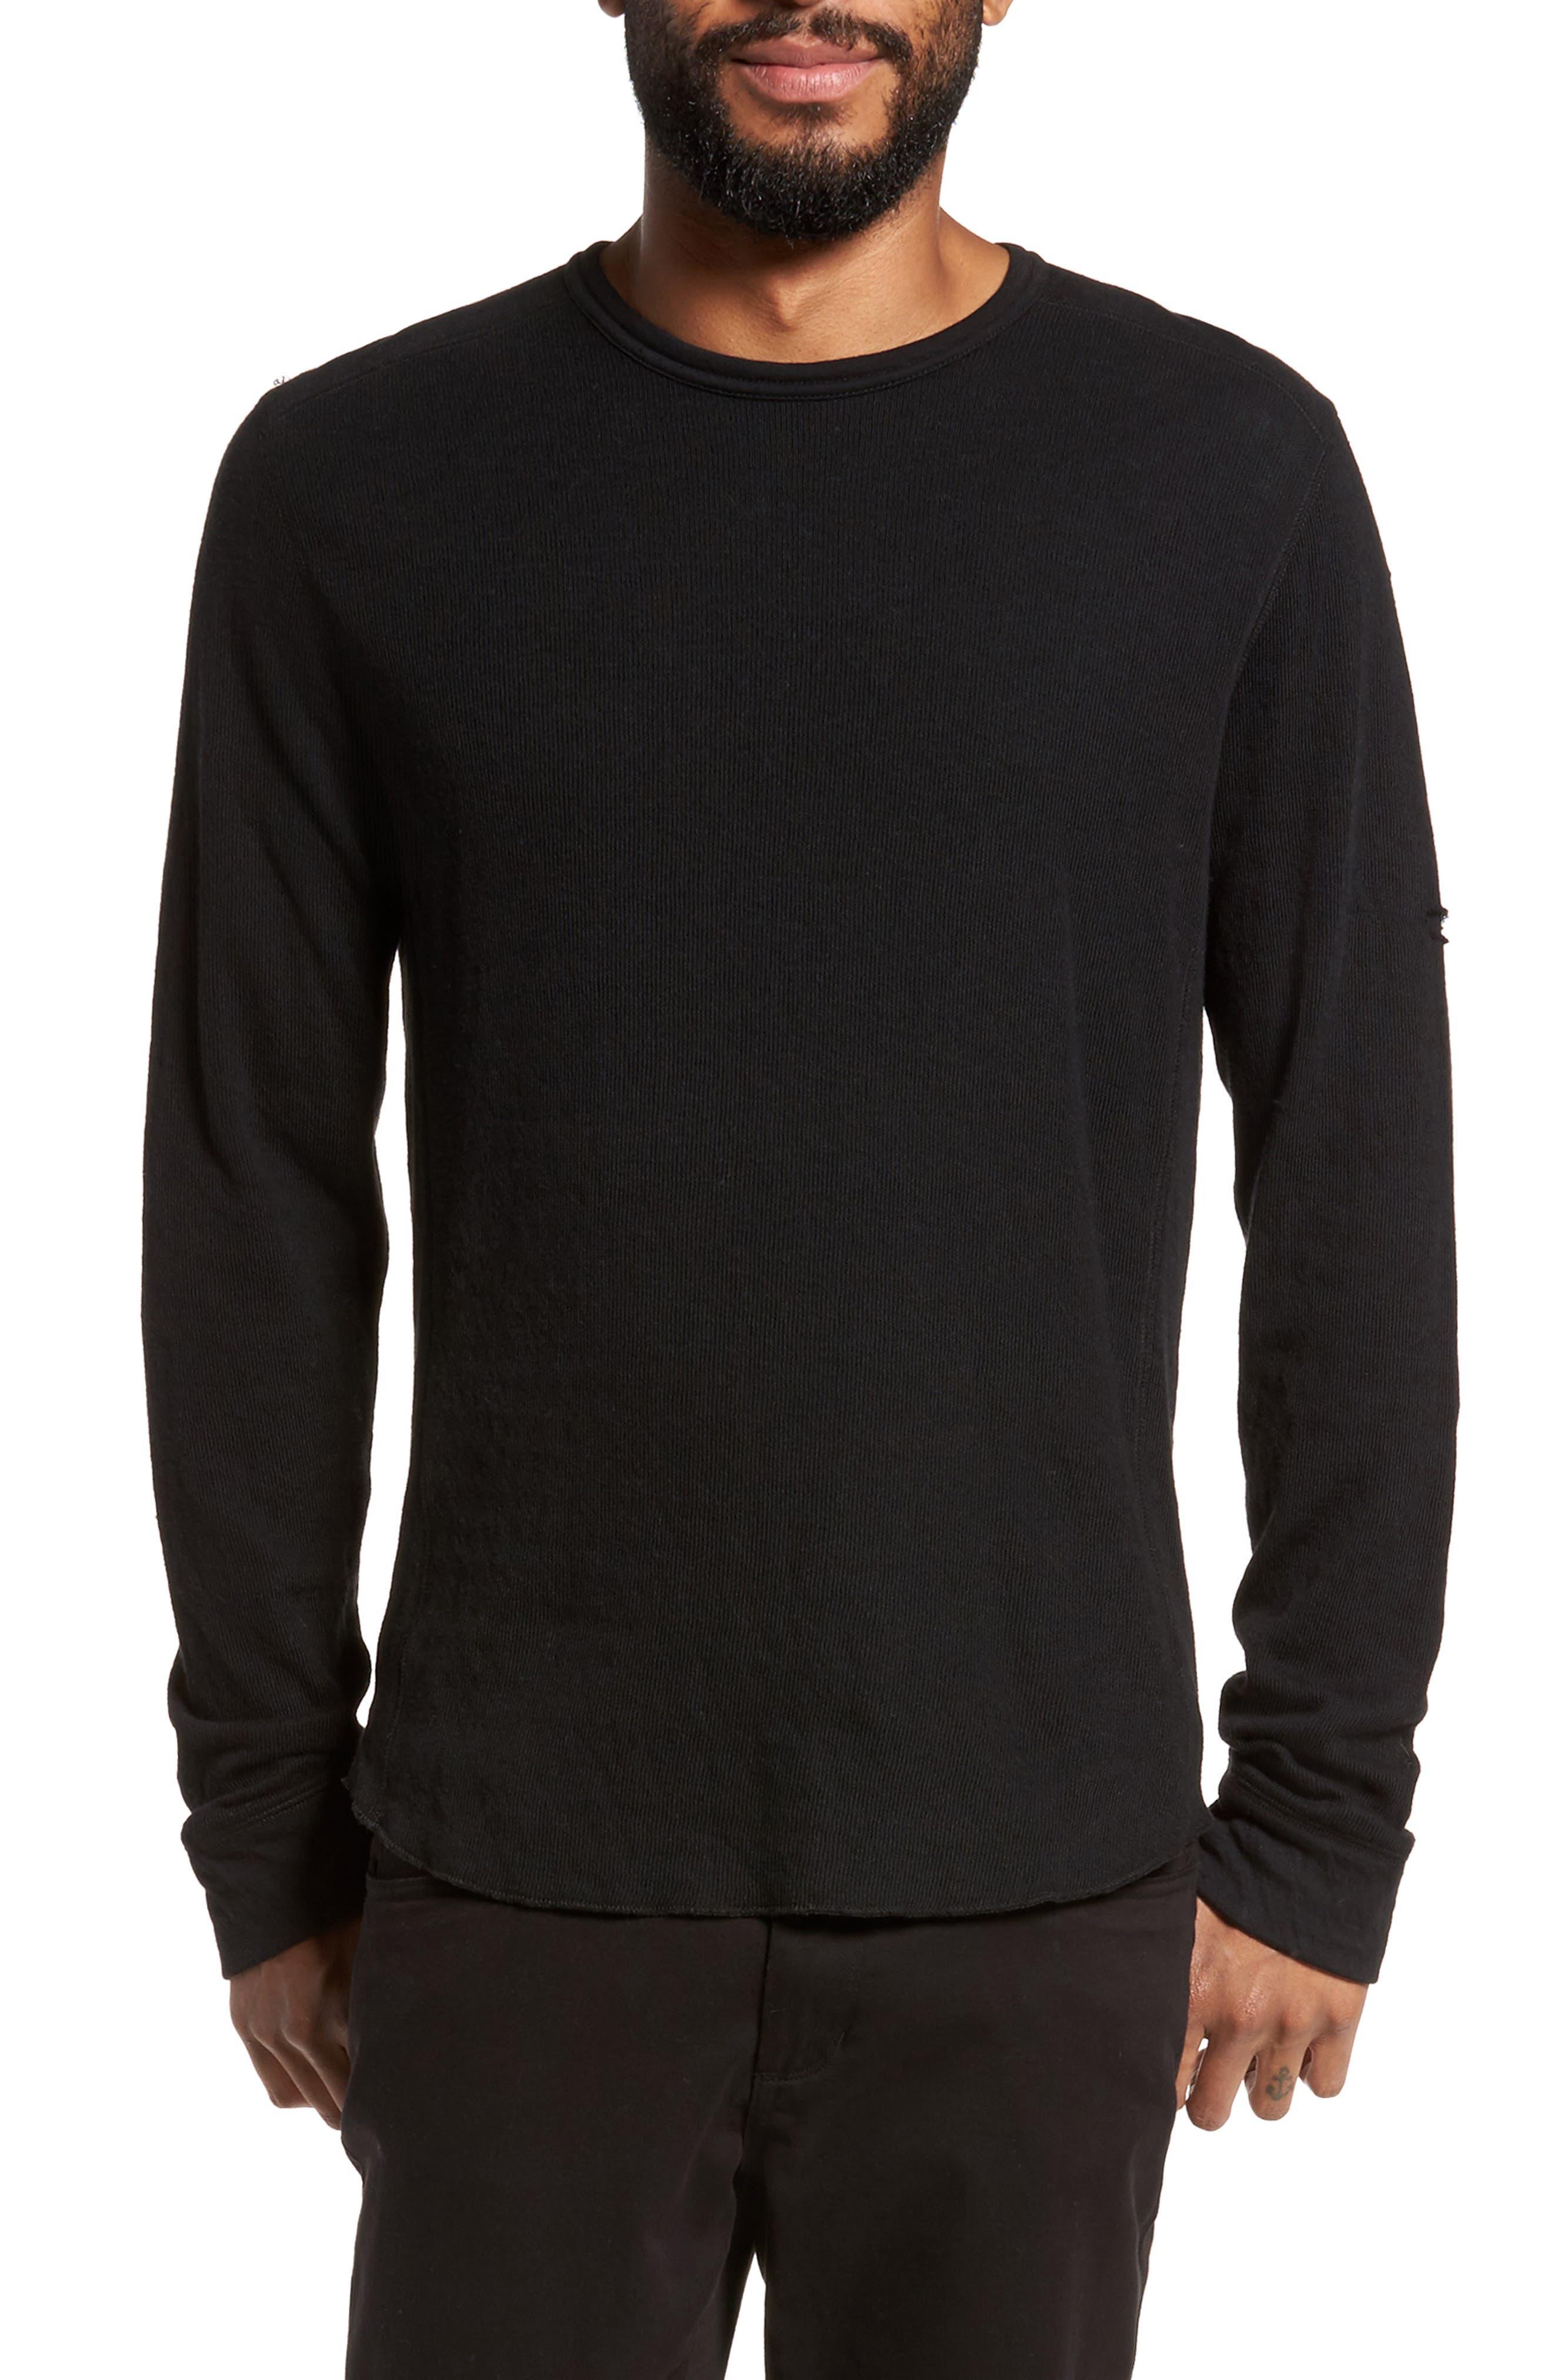 VINCE, Double Knit Long Sleeve T-Shirt, Main thumbnail 1, color, BLACK